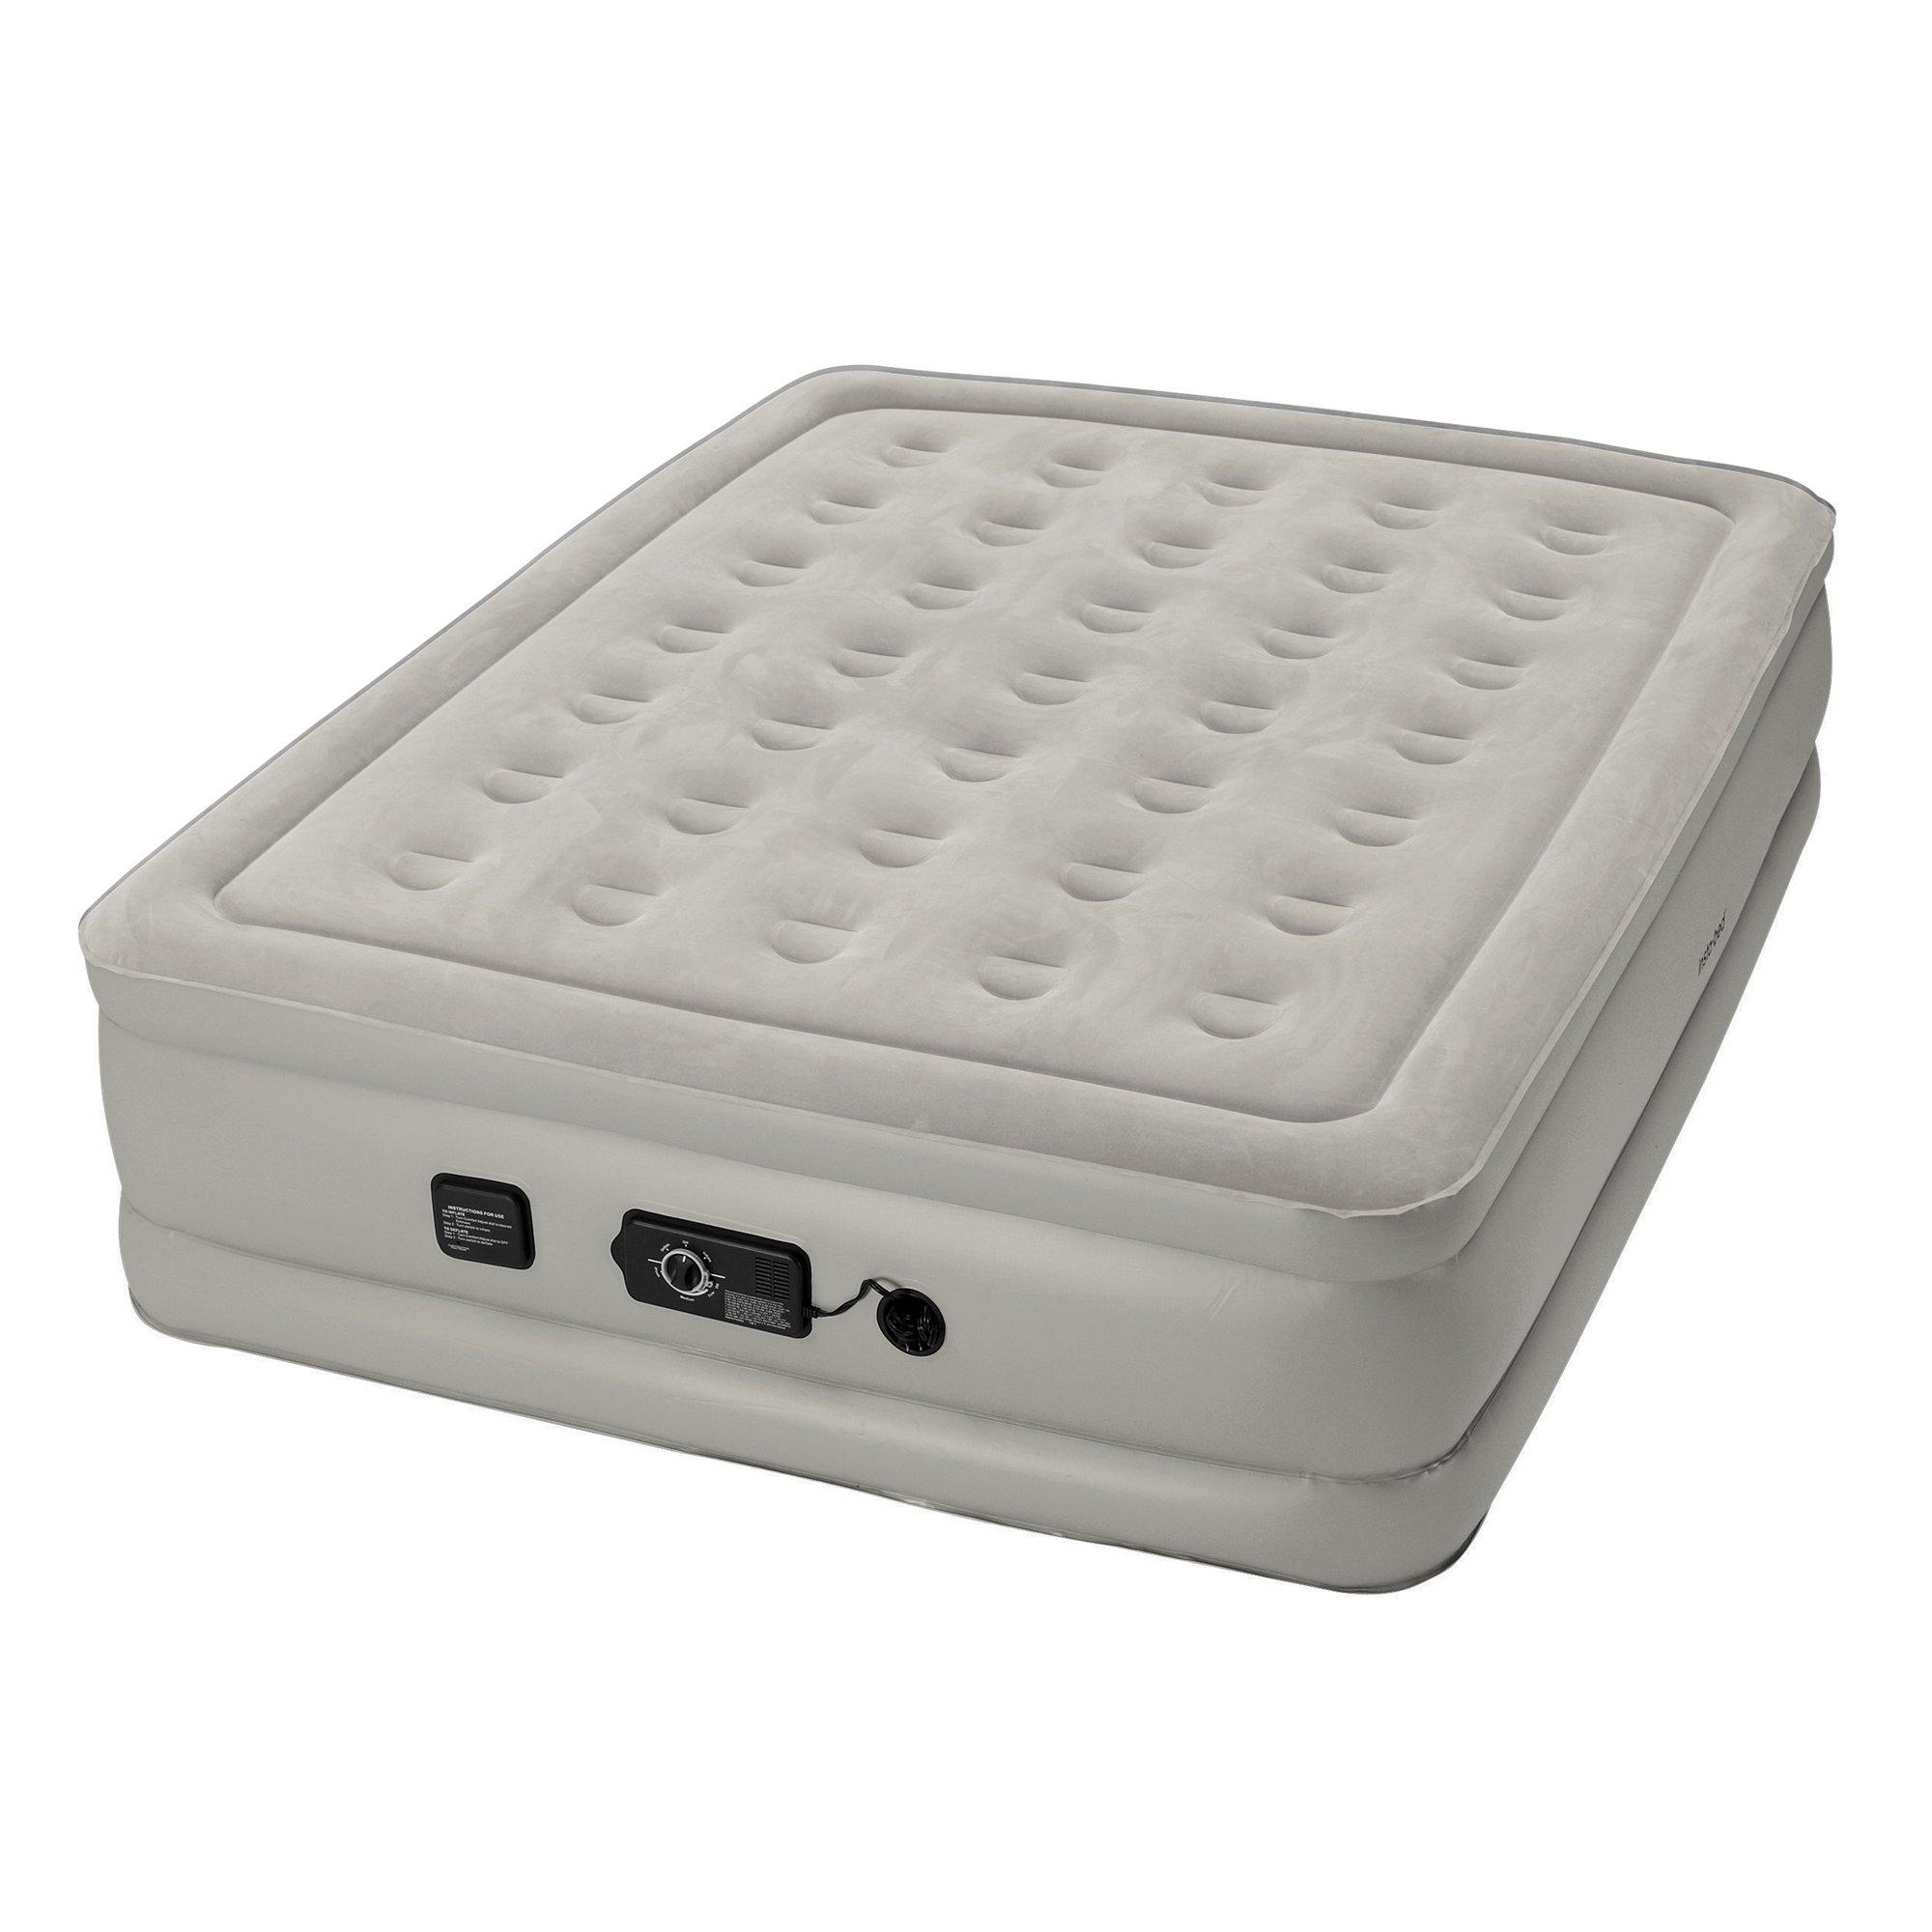 Insta-Bed Raised Air Mattress with Neverflat Pump, Grey, Full